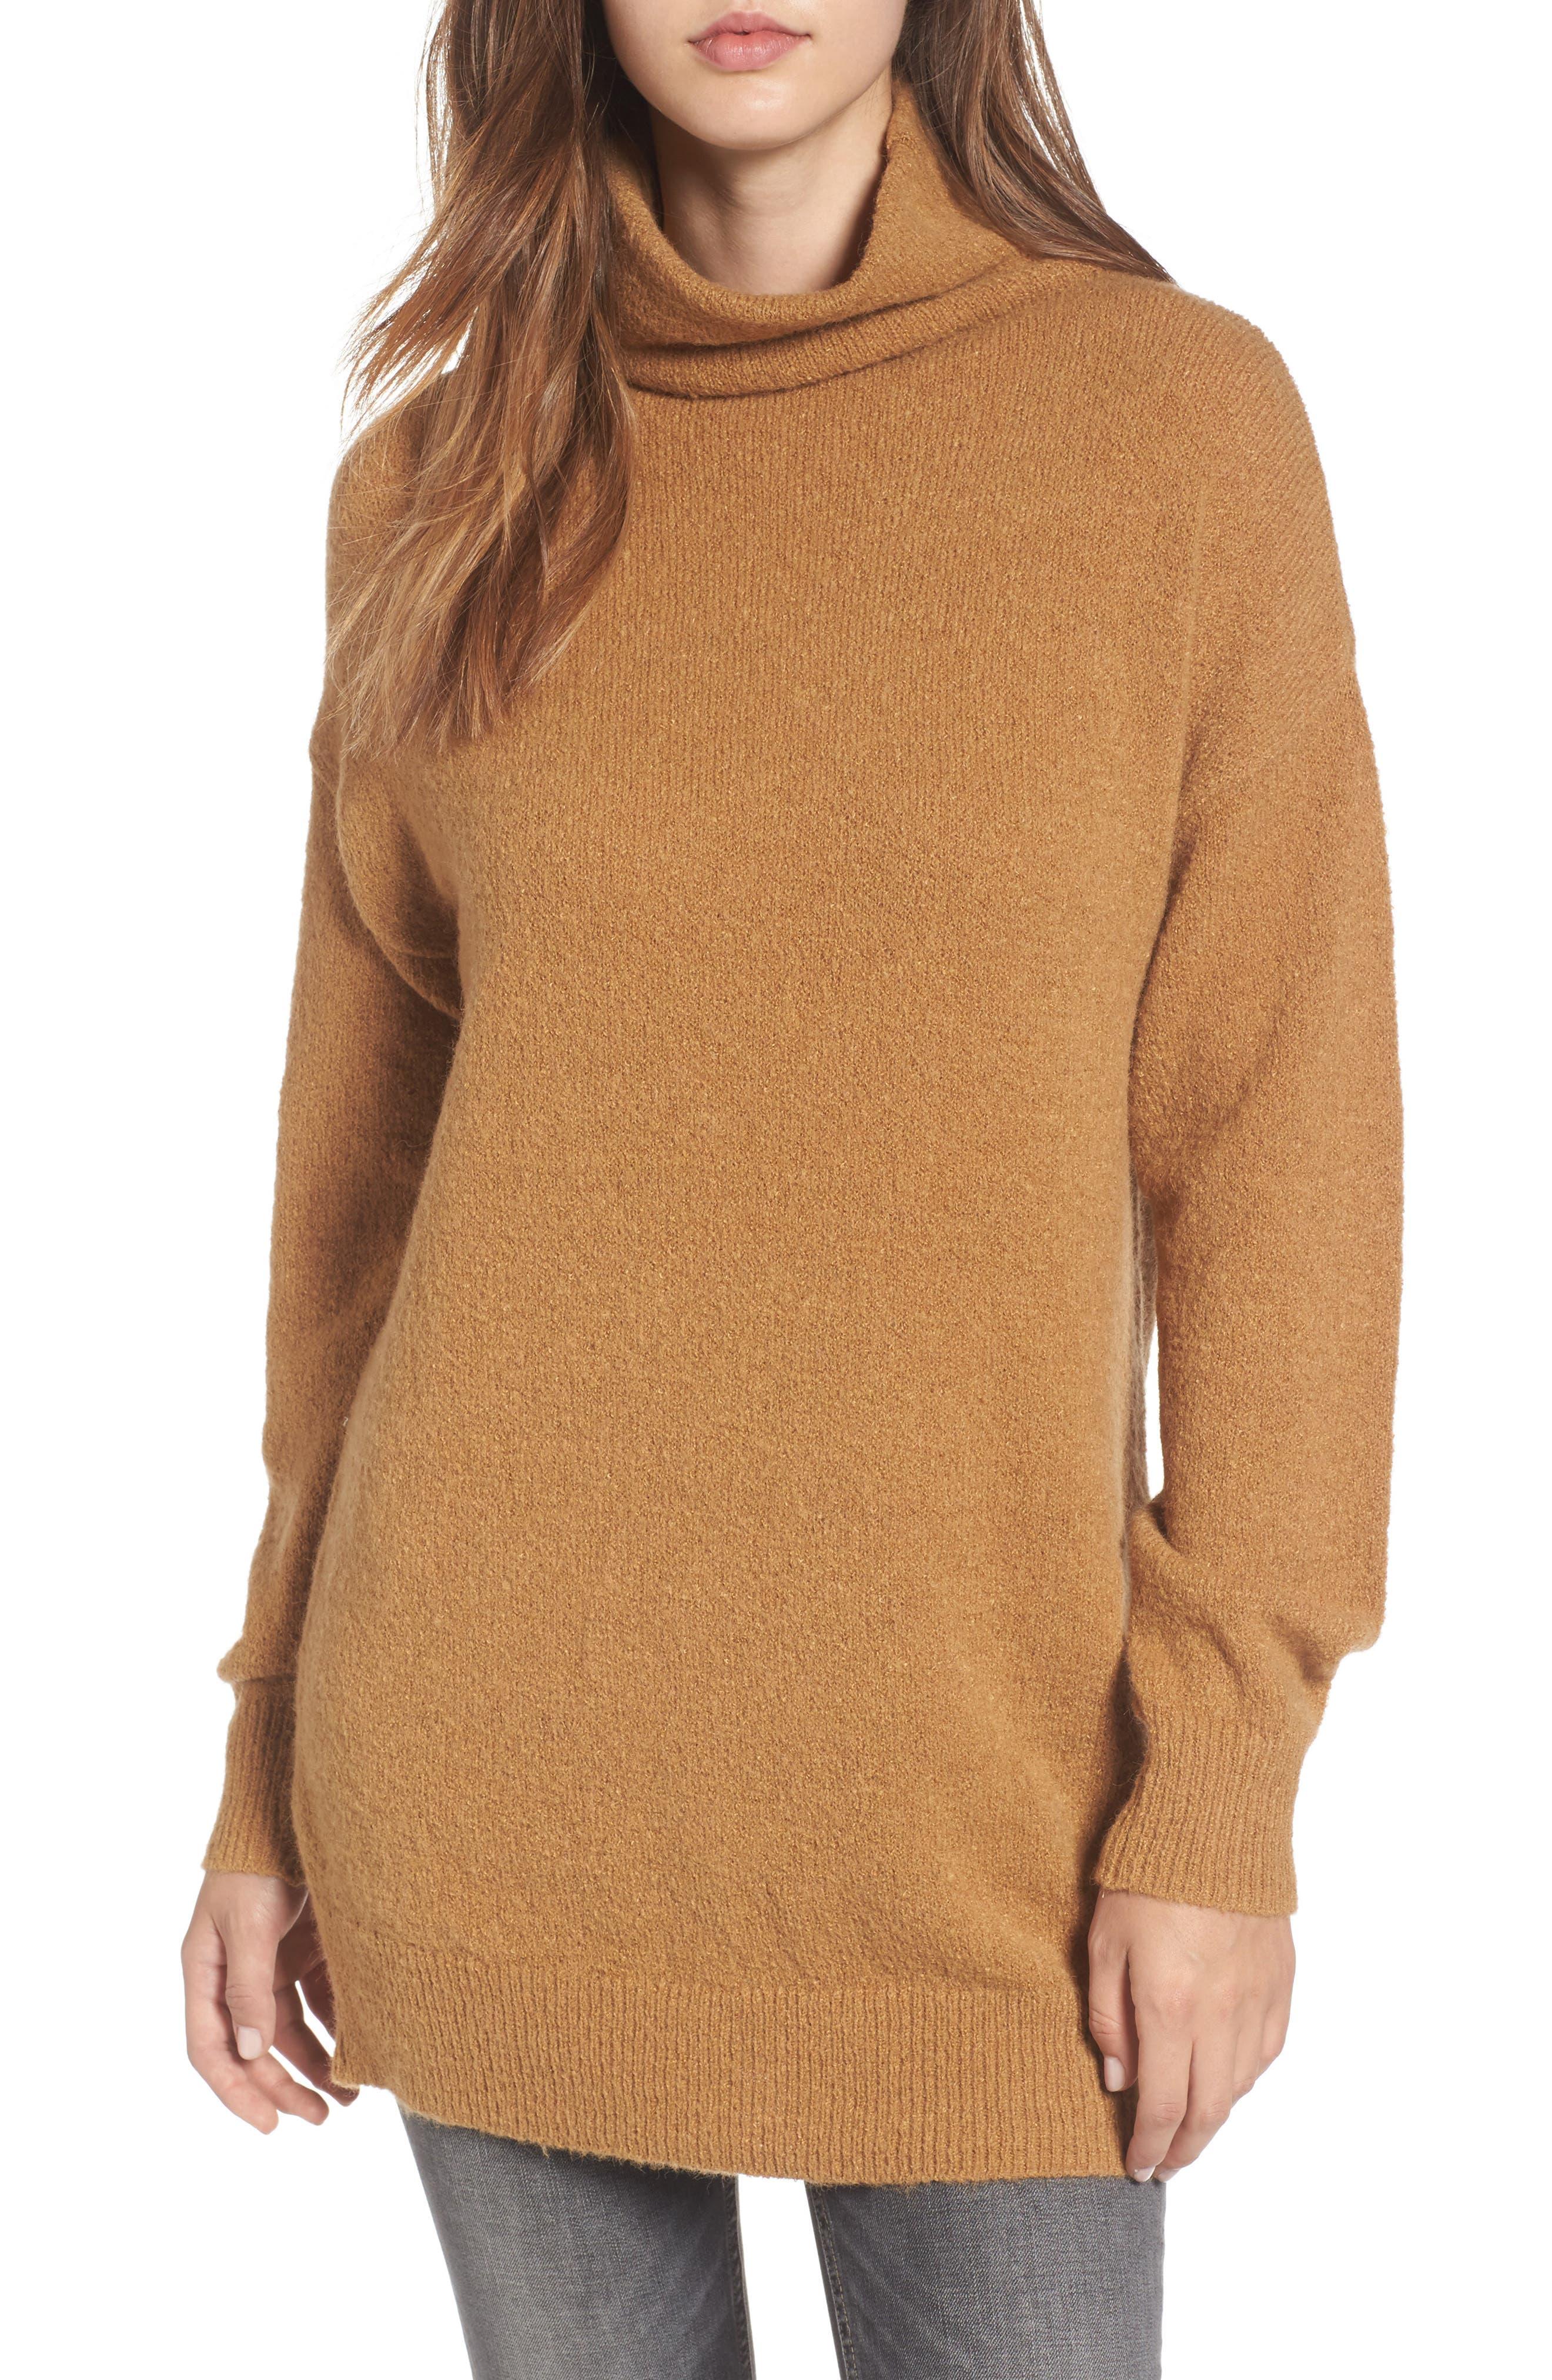 Alternate Image 1 Selected - BP. Bouclé Turtleneck Tunic Sweater